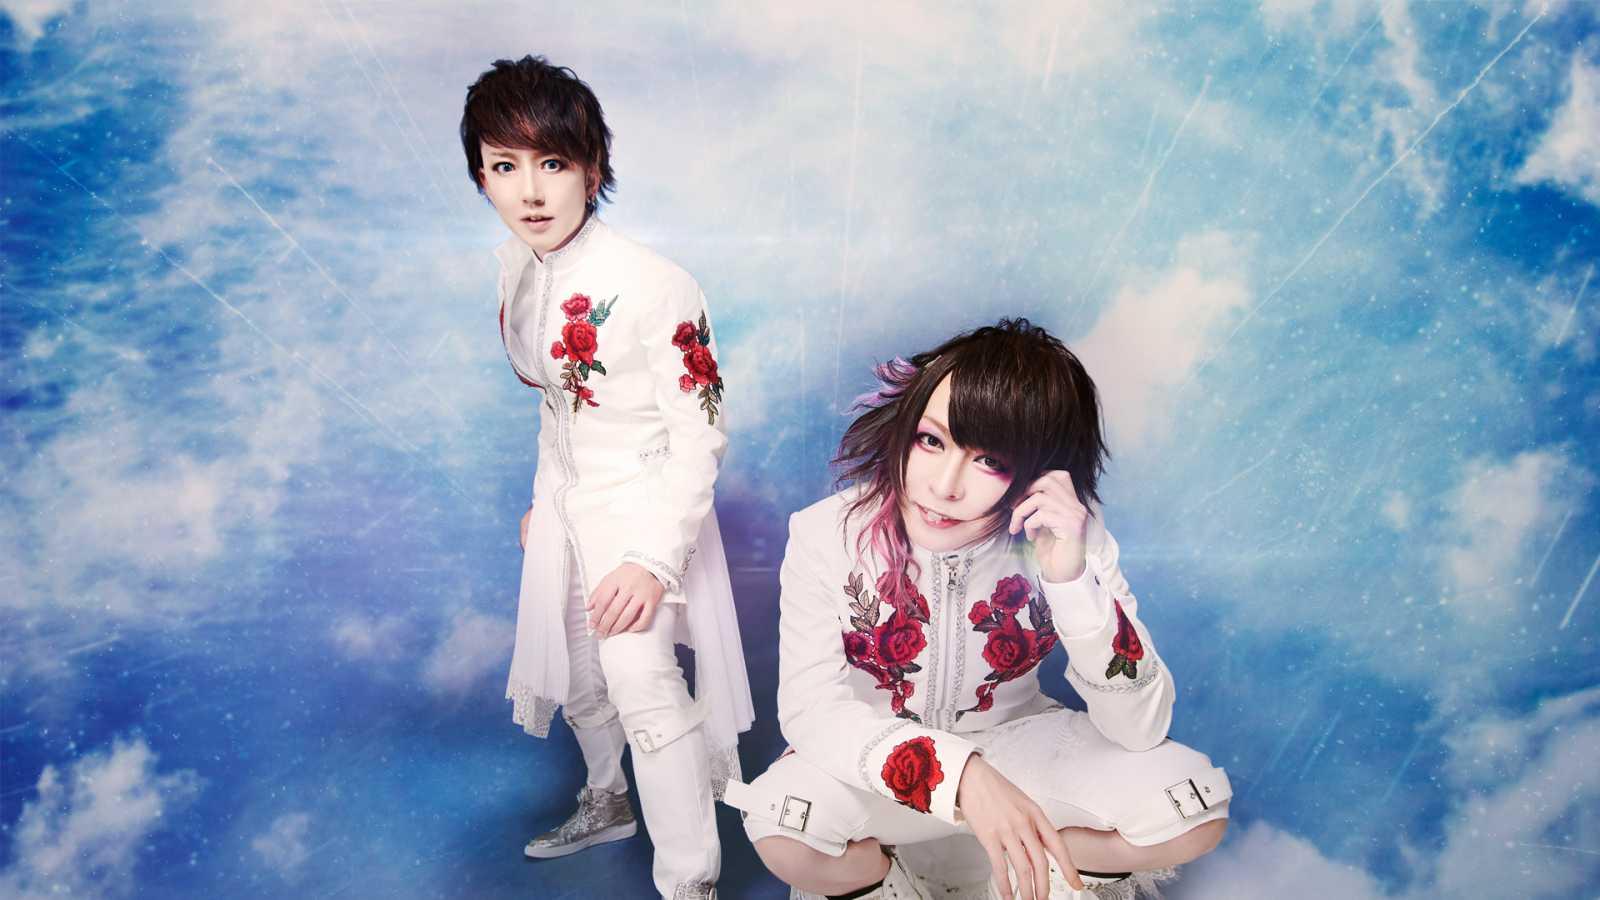 Novo mini-álbum do Kra © PS COMPANY Co.,Ltd. All Rights Reserved.